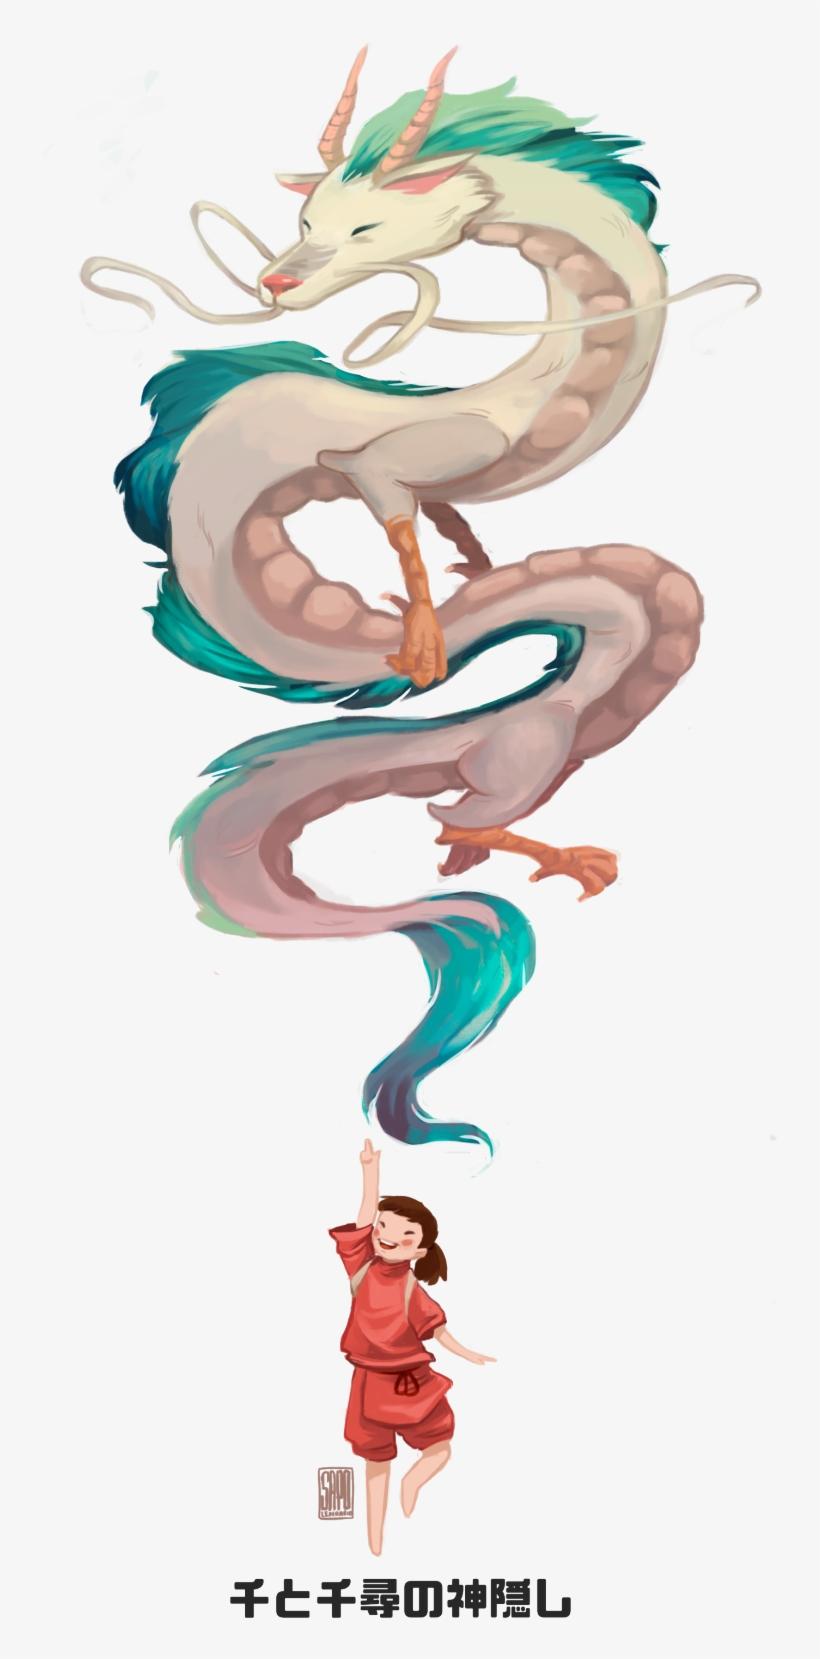 Spirited Away Kohaku And Chihiro Artwork By Sapolendario Viagem De Chihiro Fan Art Transparent Png 1280x1757 Free Download On Nicepng